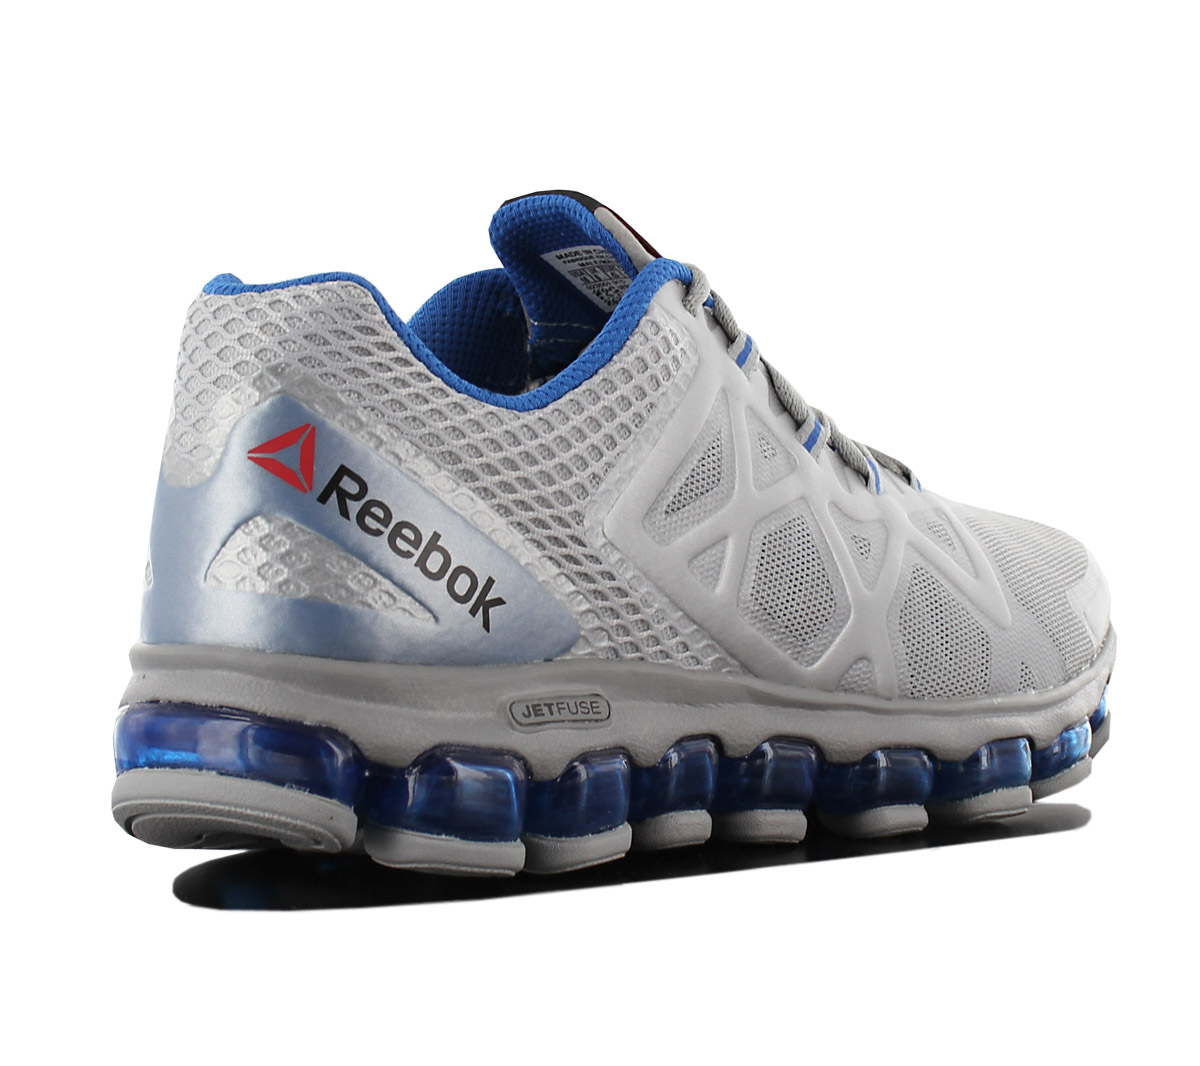 Reebok Zjet Burst Men s Running Shoes Trainers Running Jetfuse ... 1e5e956fc